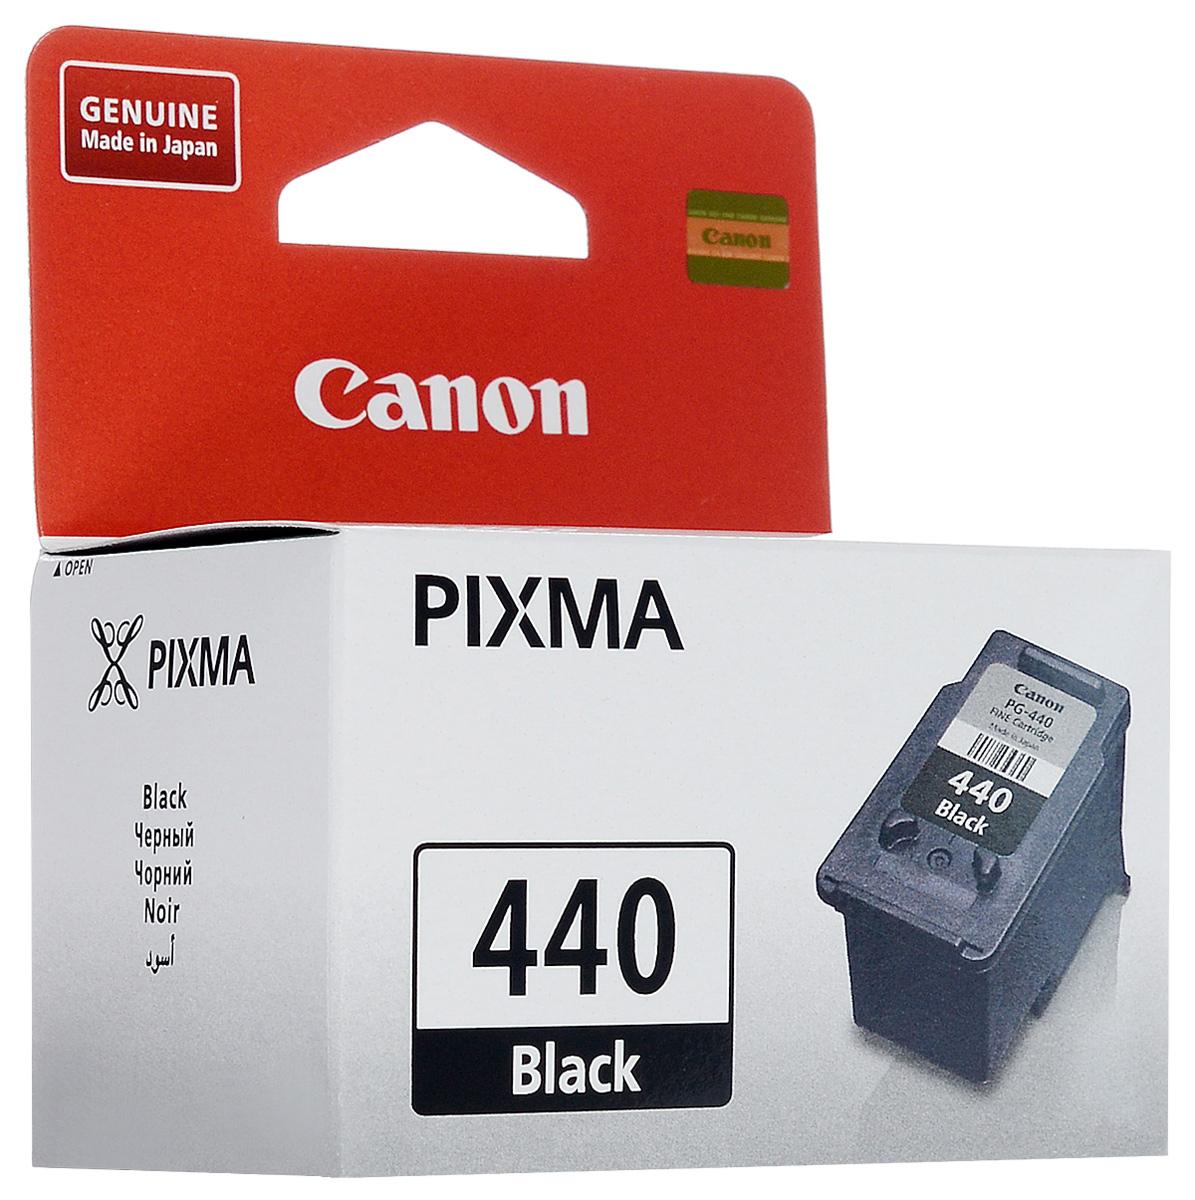 Canon PG-440BK, Black картридж для струйных МФУ/принтеров картридж canon kp 108in 3115b001